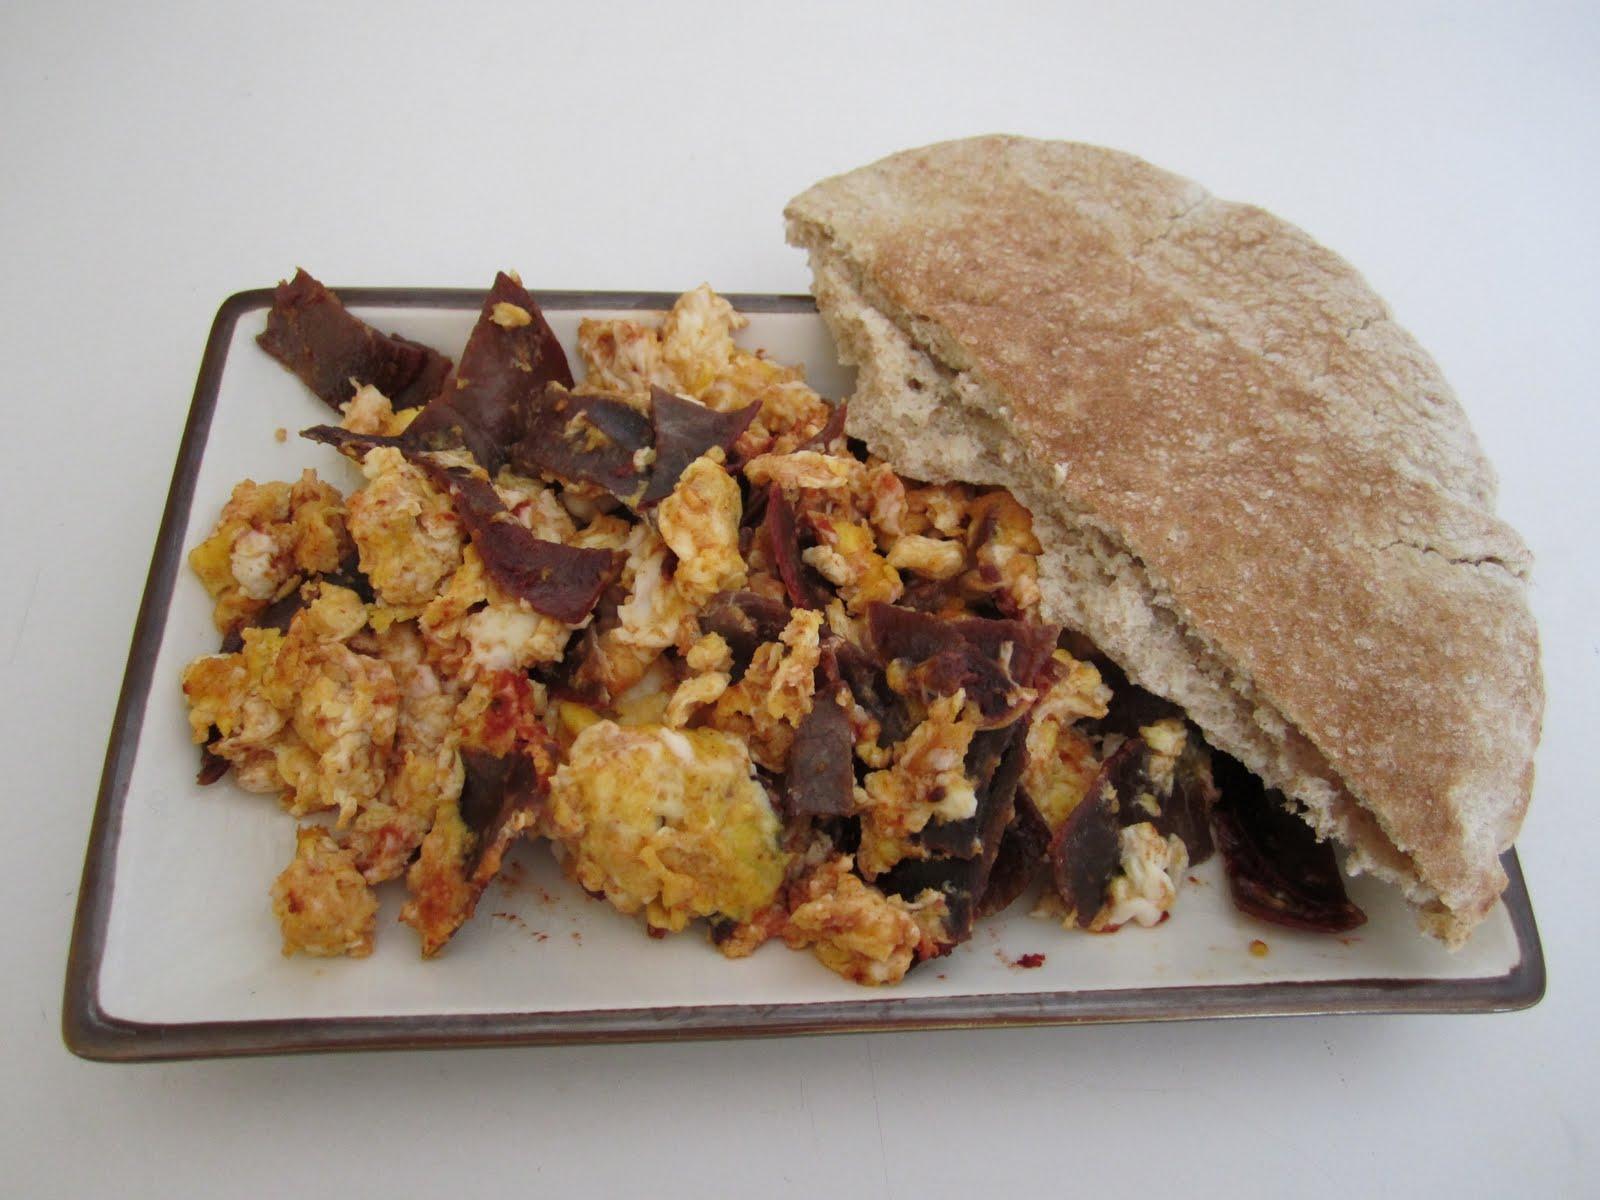 Basturma at home: recipe 17